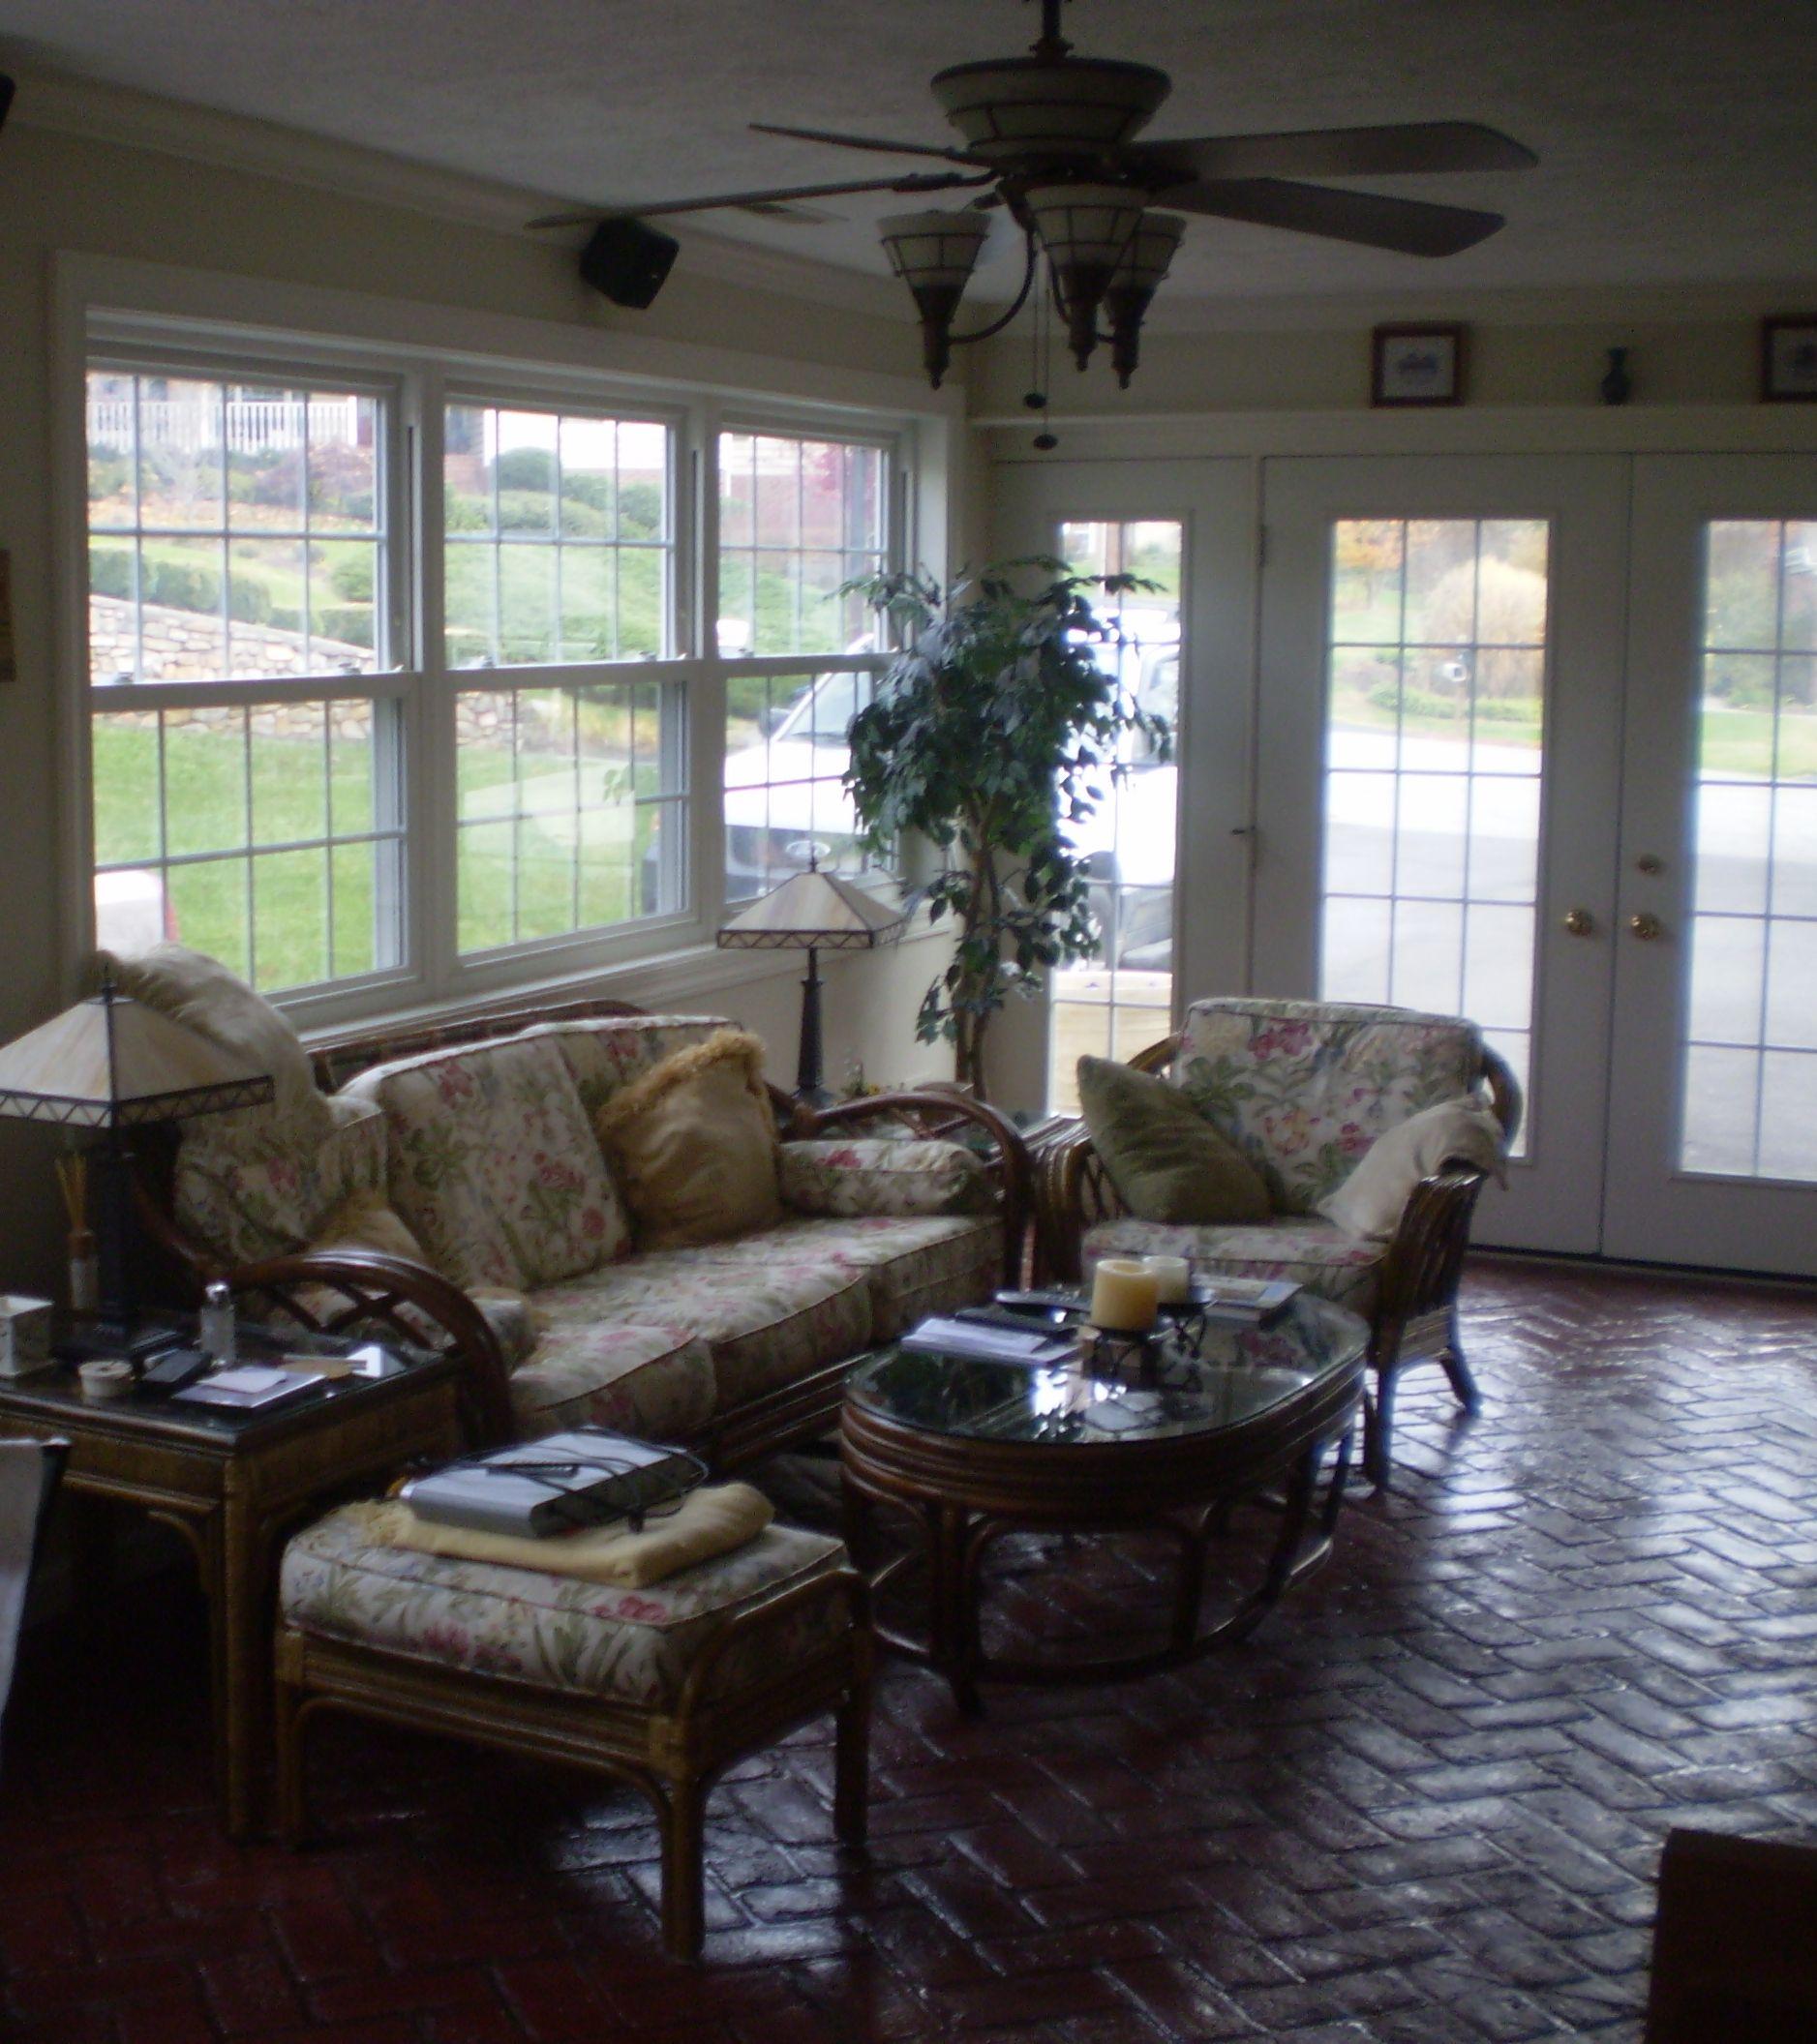 Single Carport Converted To An All Season Room Carport Room Home